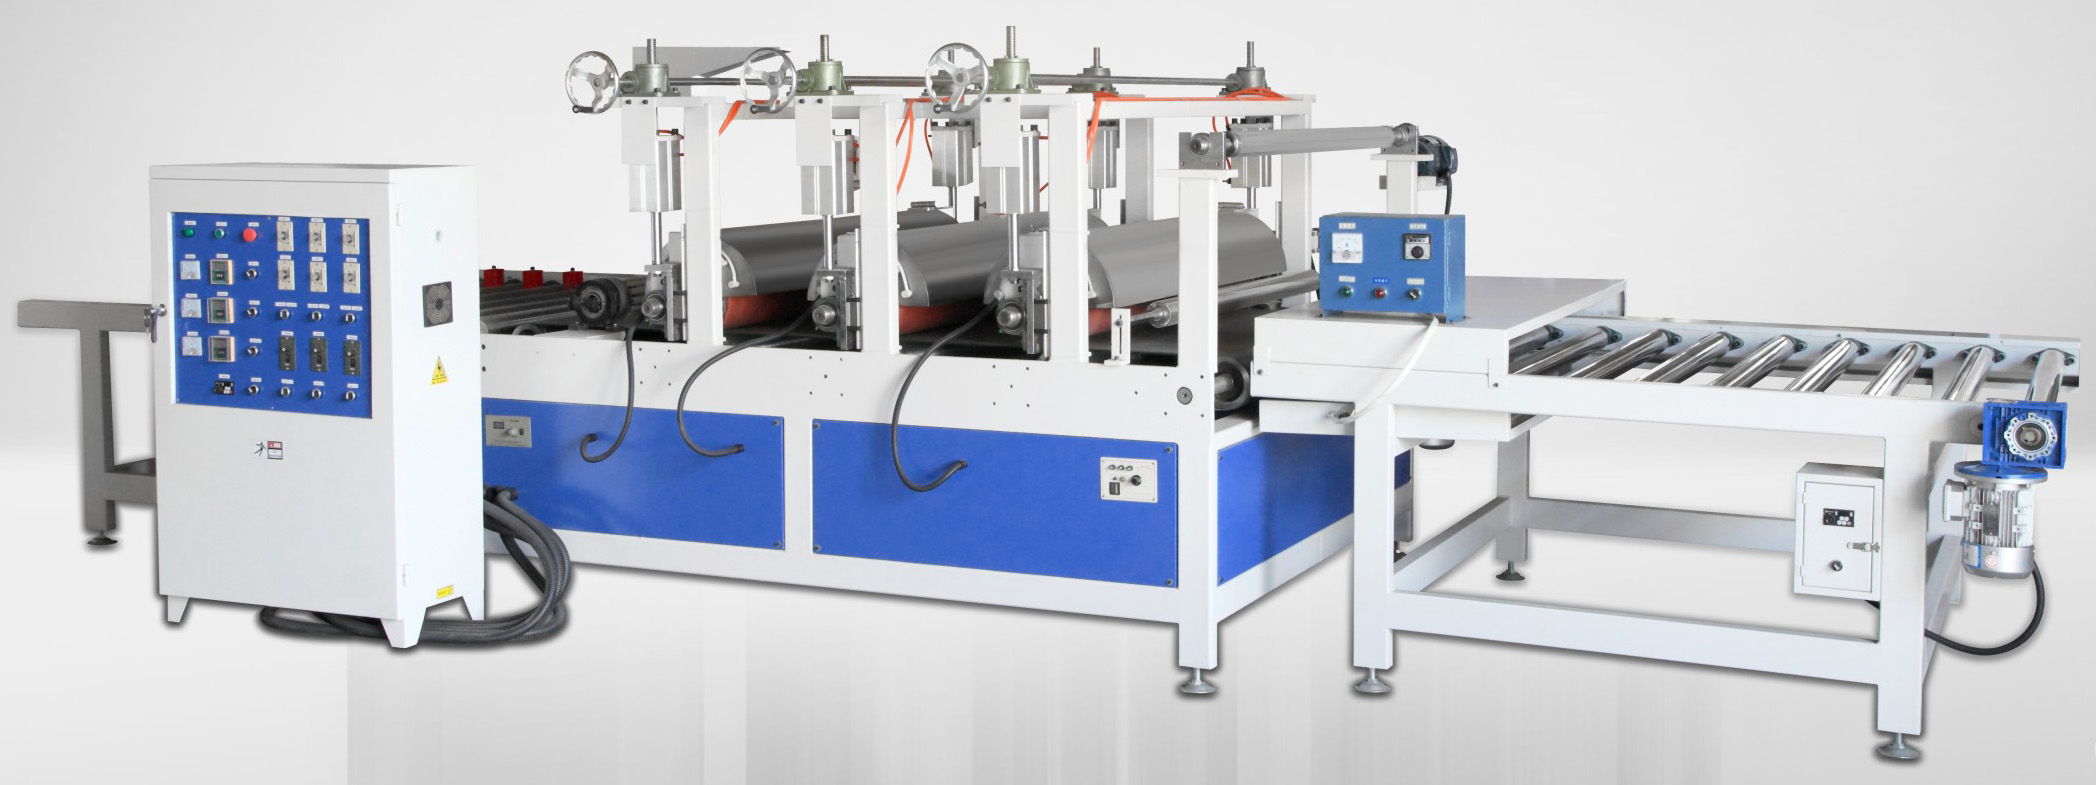 pvc板材热烫印机